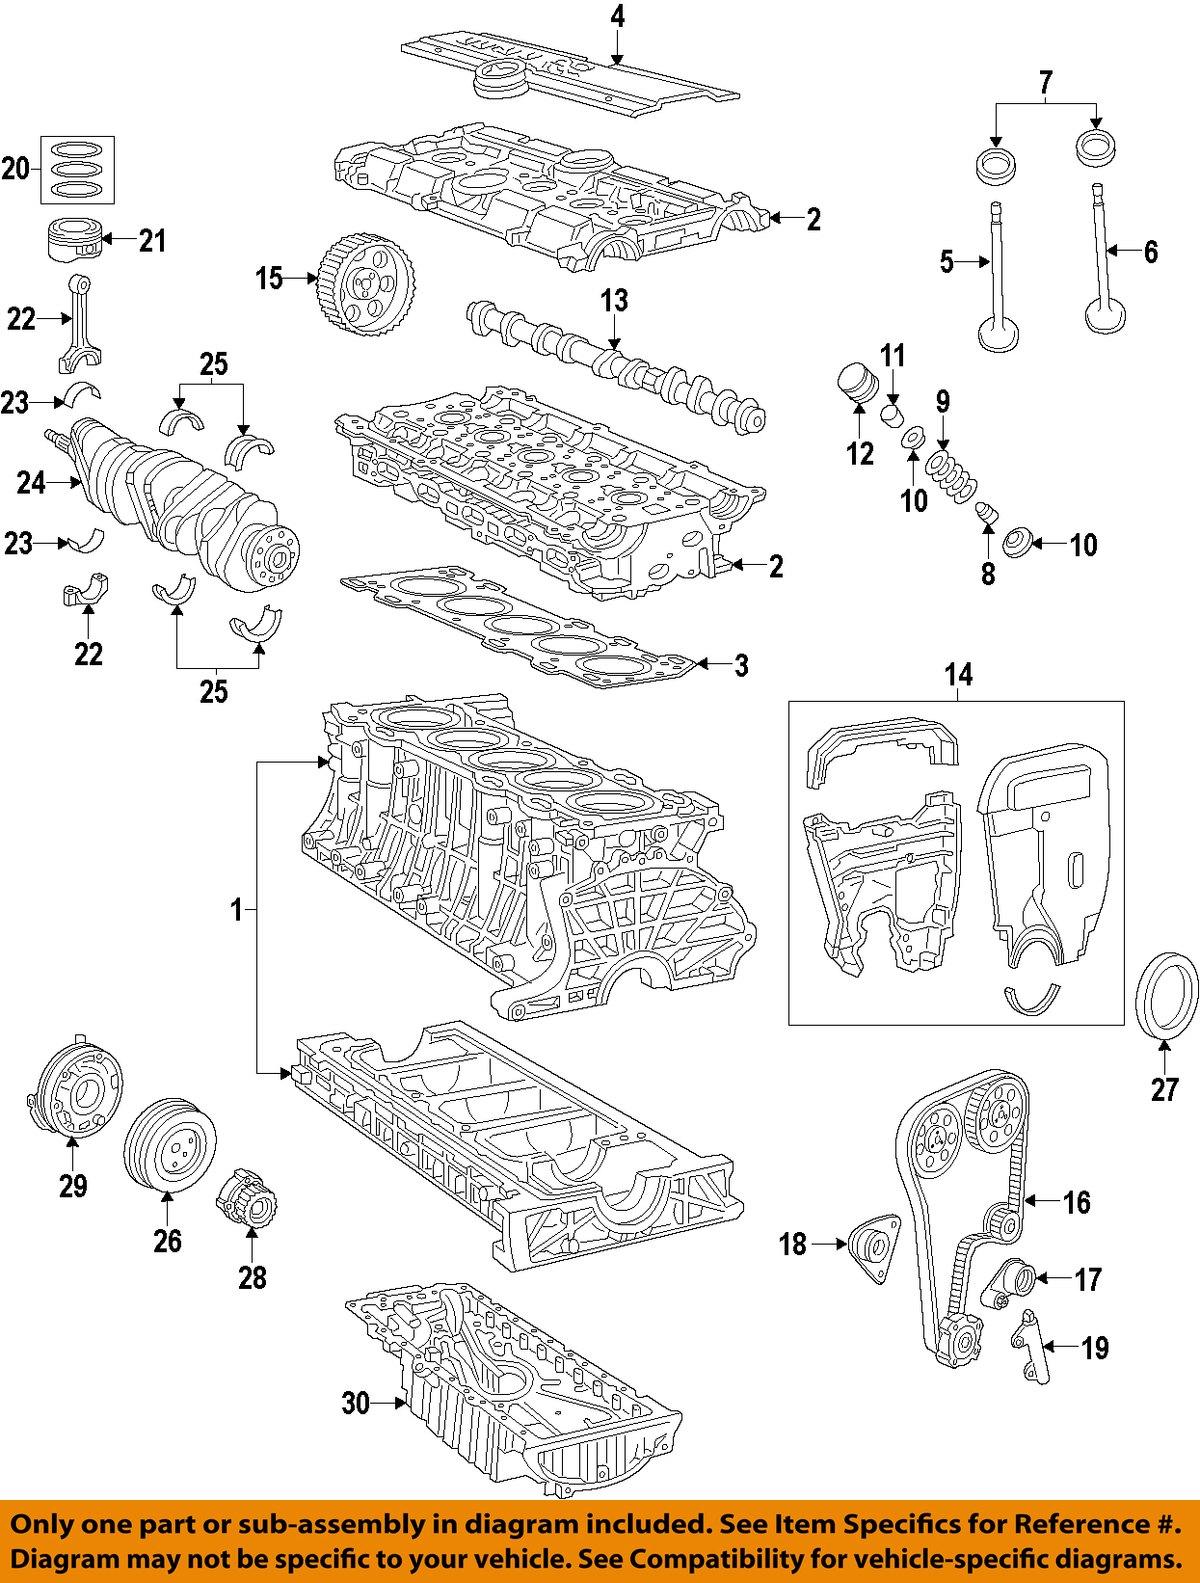 volvo wiring diagram s60 volvo wiring diagrams description oediag2 f54a035 volvo wiring diagram s